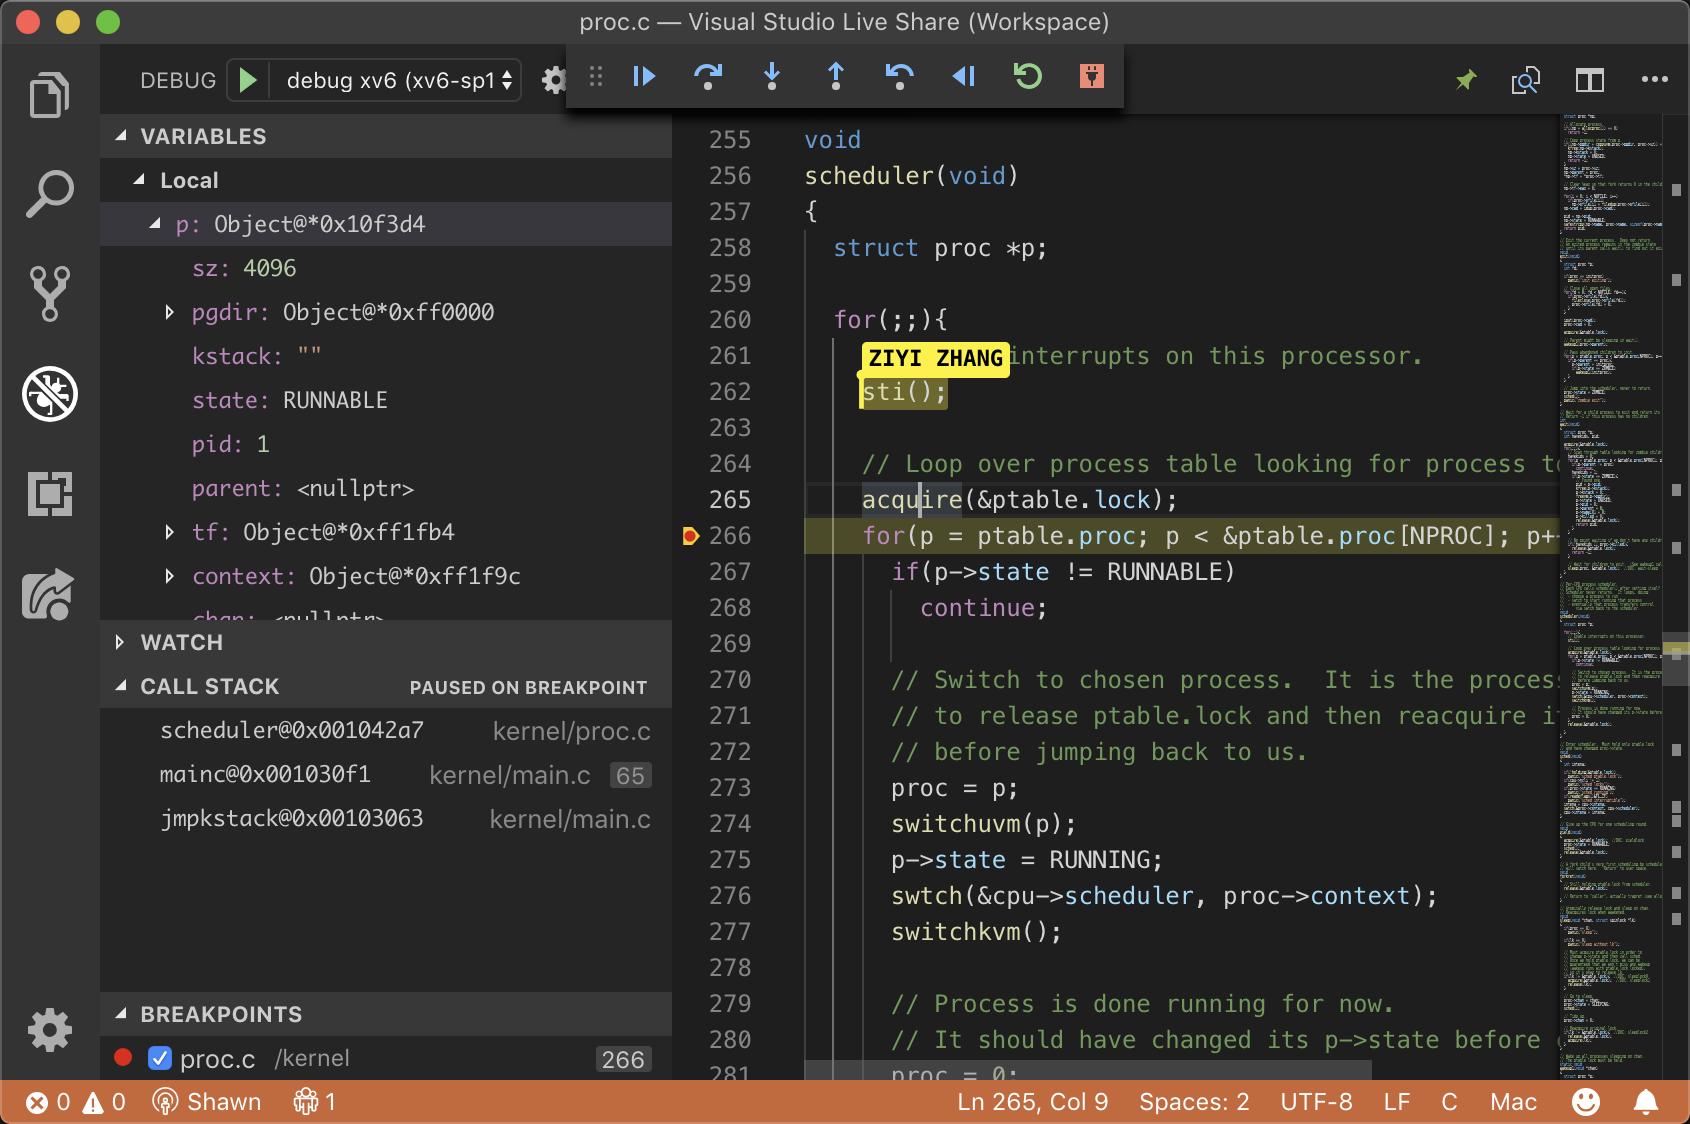 Co-debug xv6 on Windows using VSCode   Shawn Zhong - 钟万祥